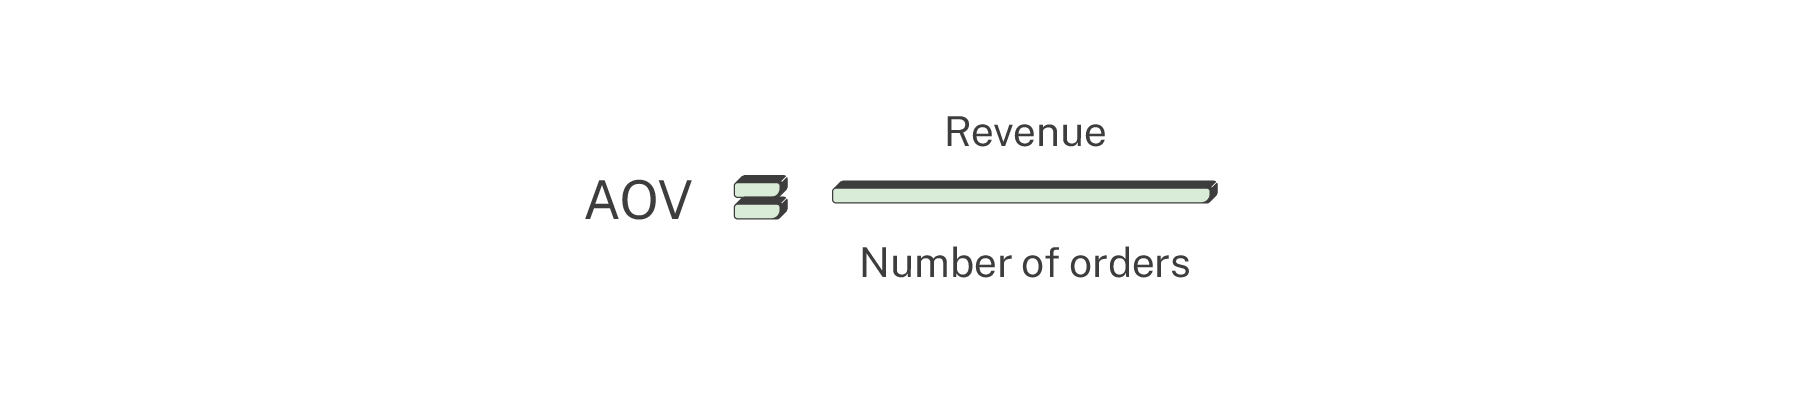 average order value calculation ecommerce